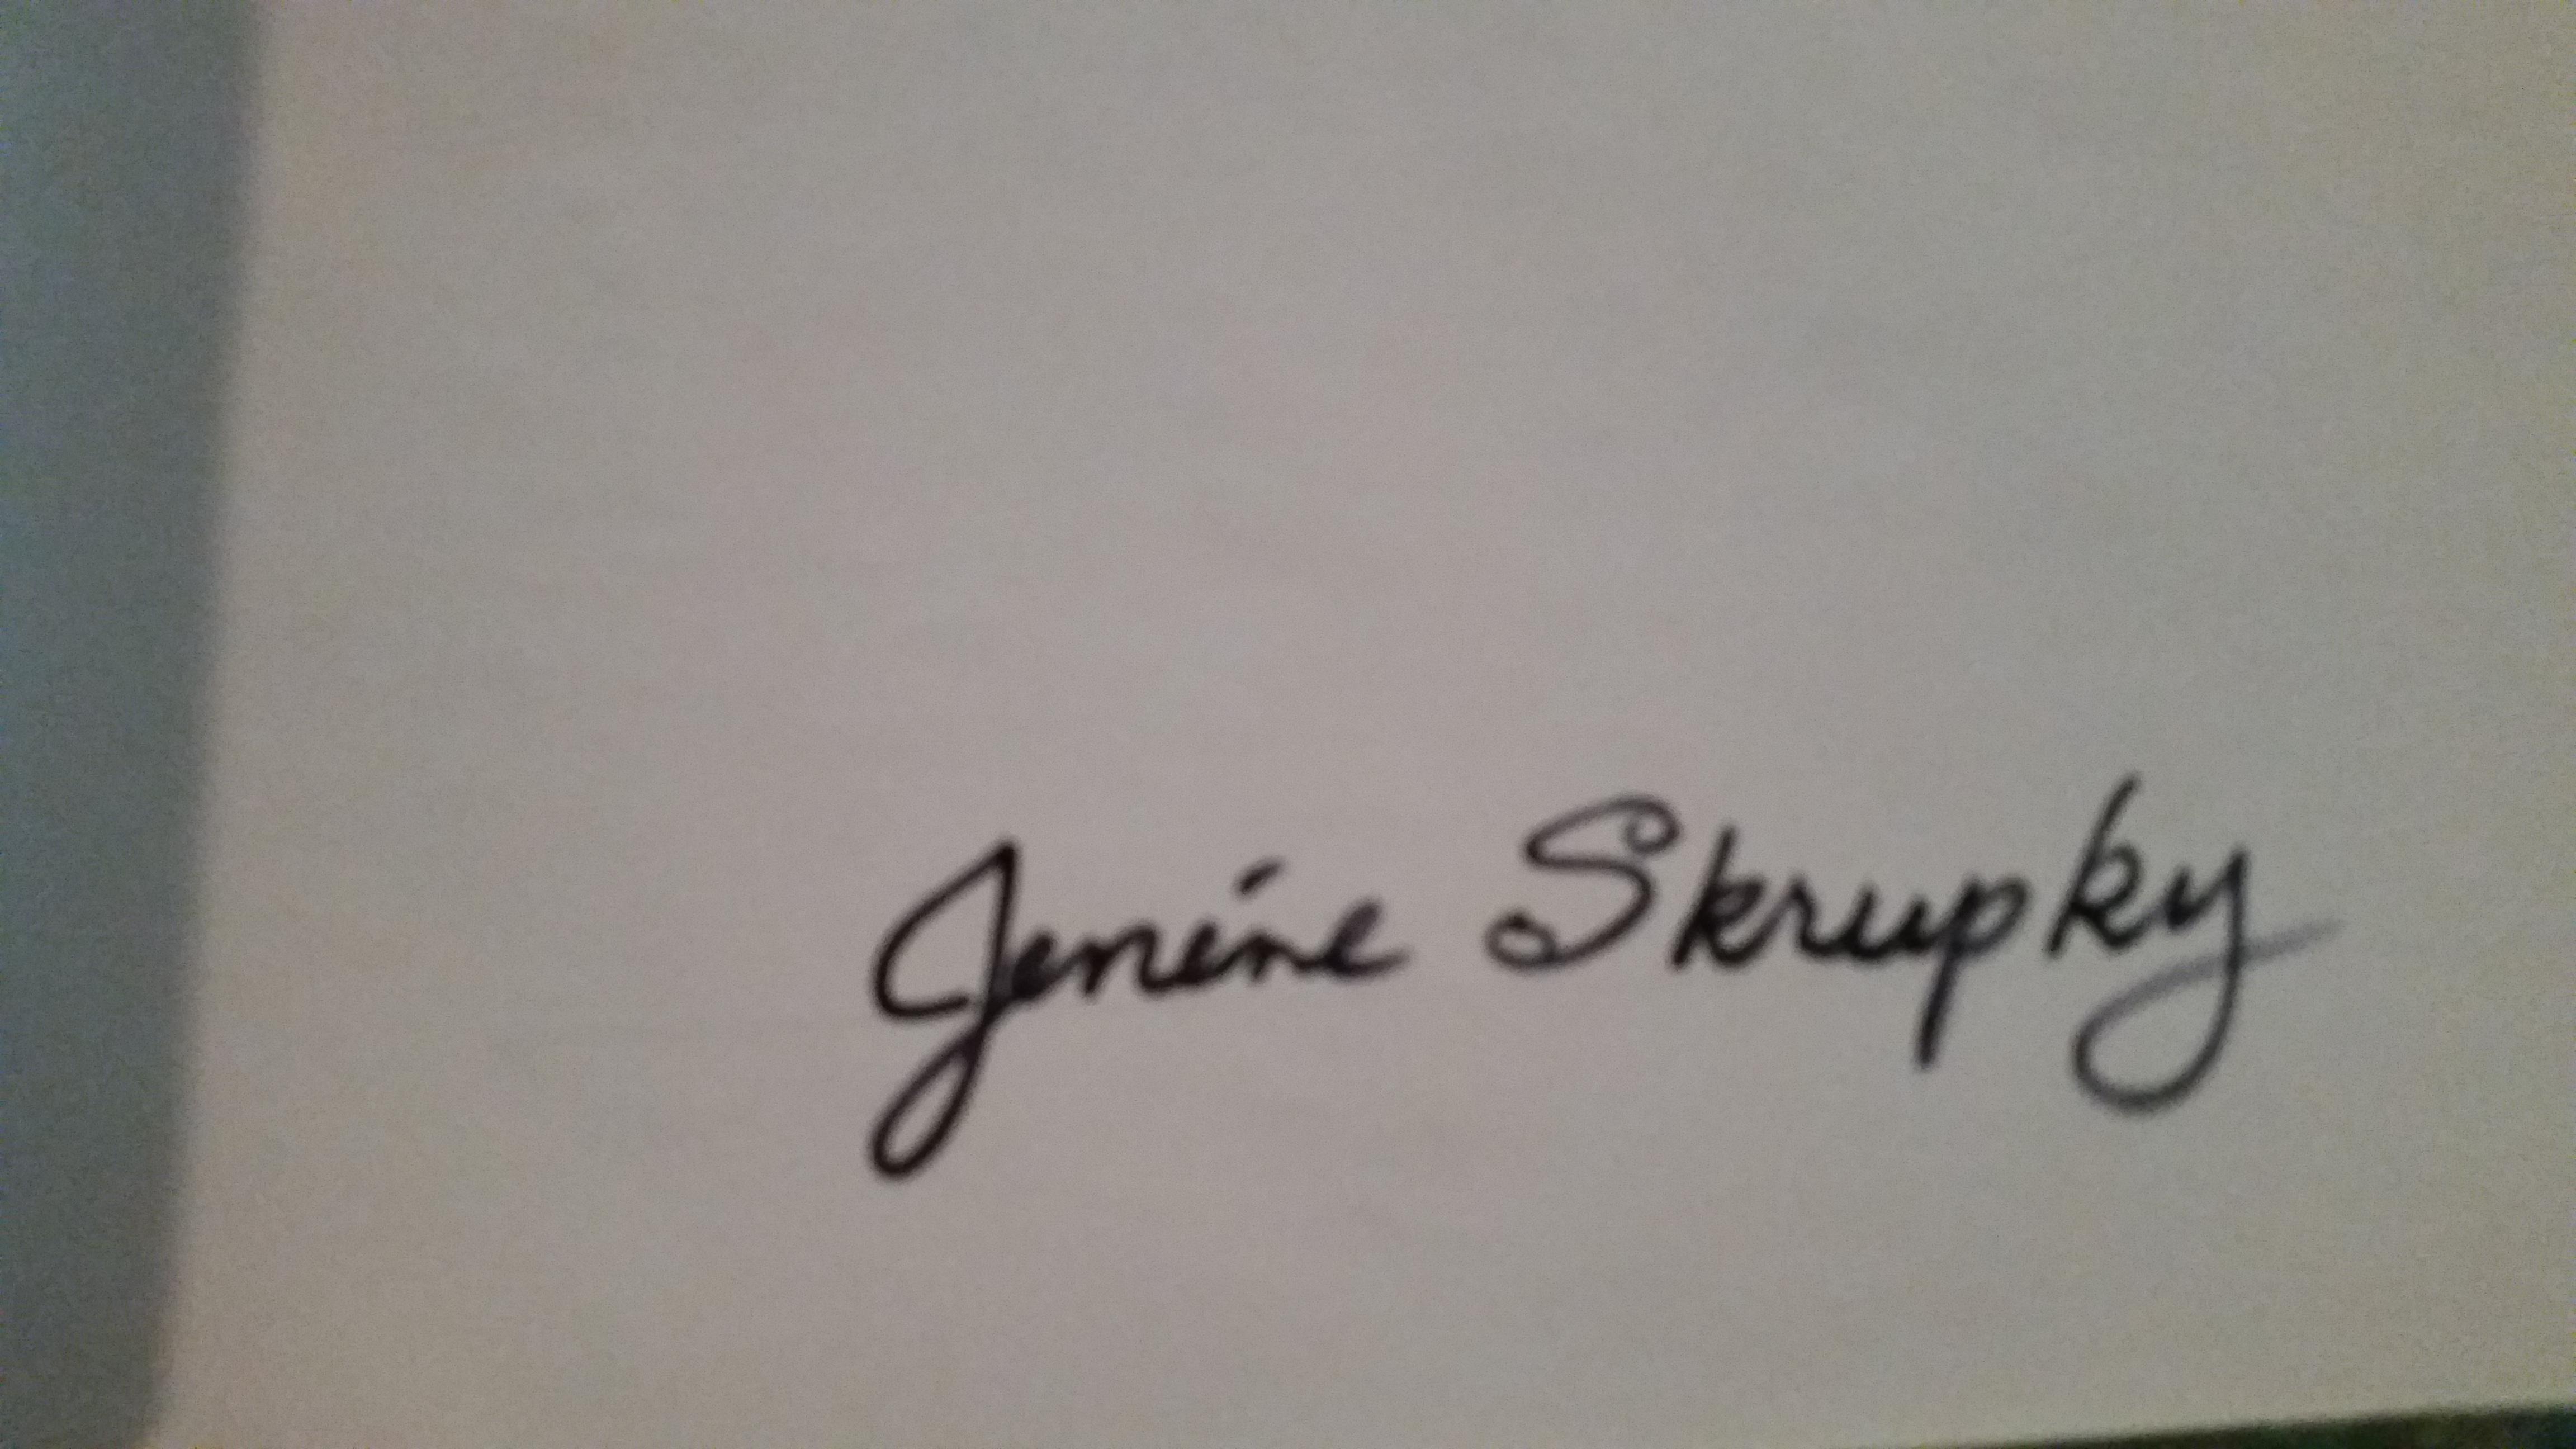 Jenene Skrupky Signature